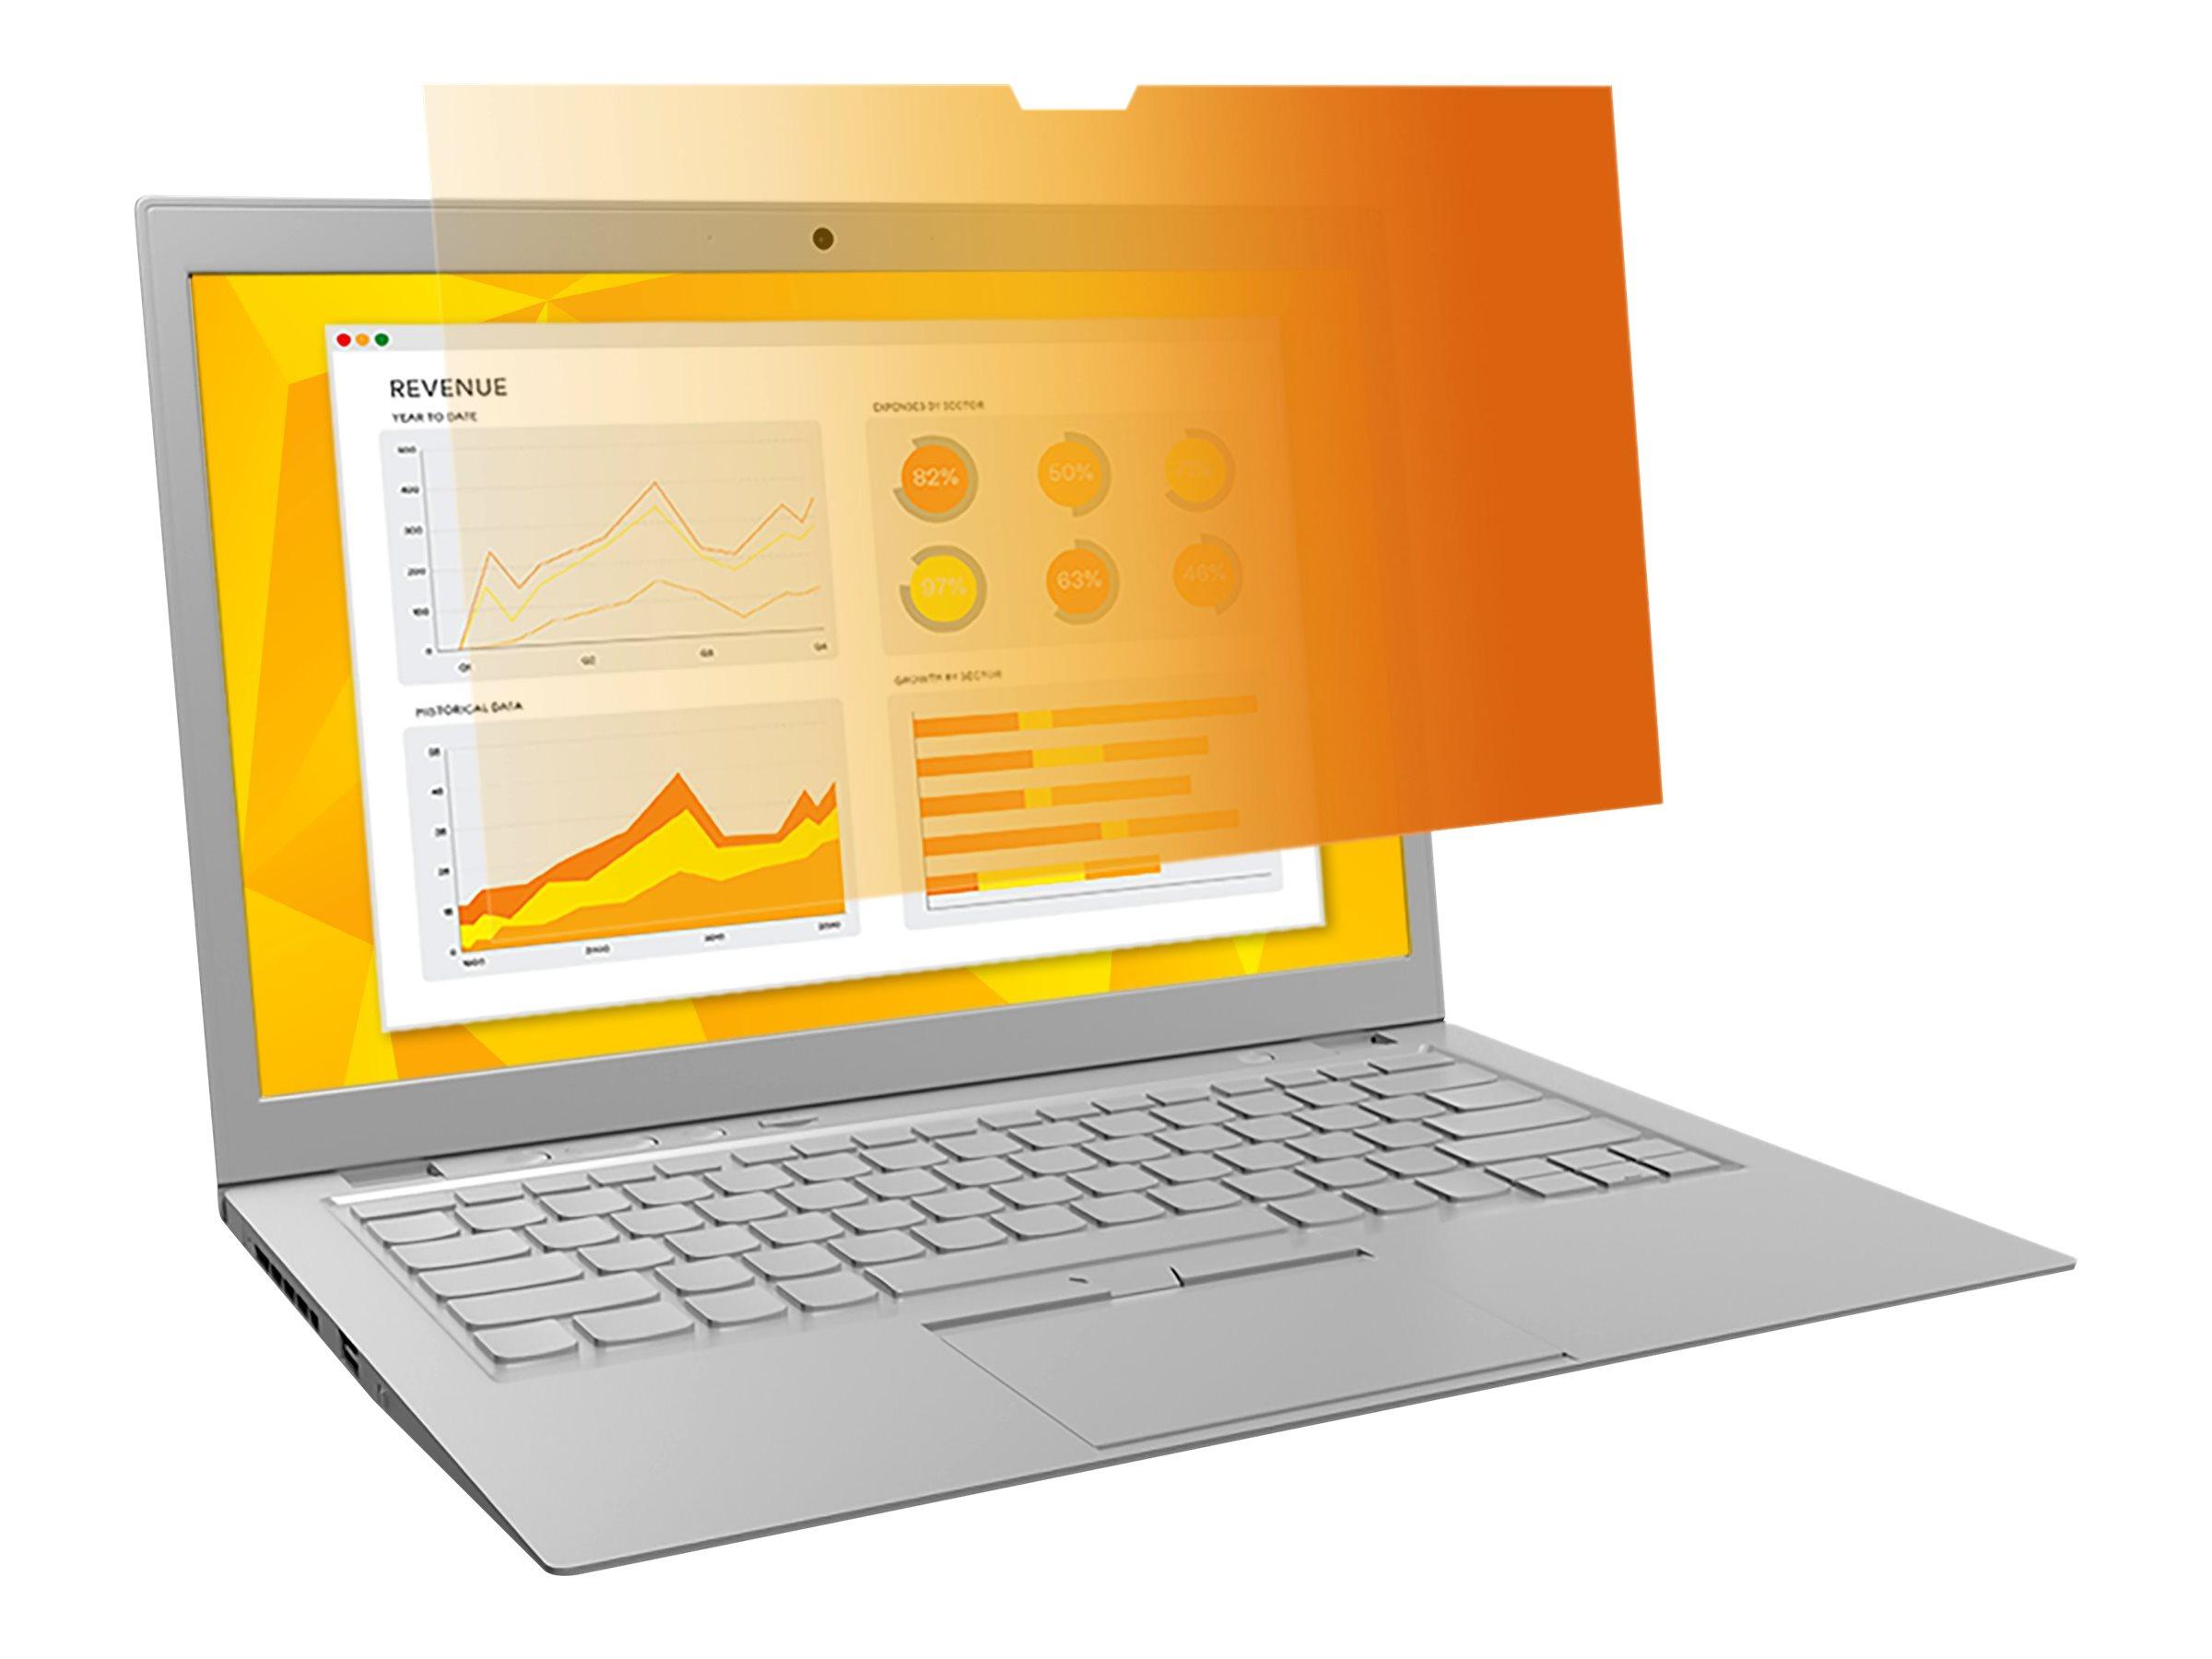 "3M Blickschutzfilter Gold 14"" Laptop with COMPLY Attachment System - Blickschutzfilter für Notebook - 35,6 cm Breitbild (14"" Breitbild)"